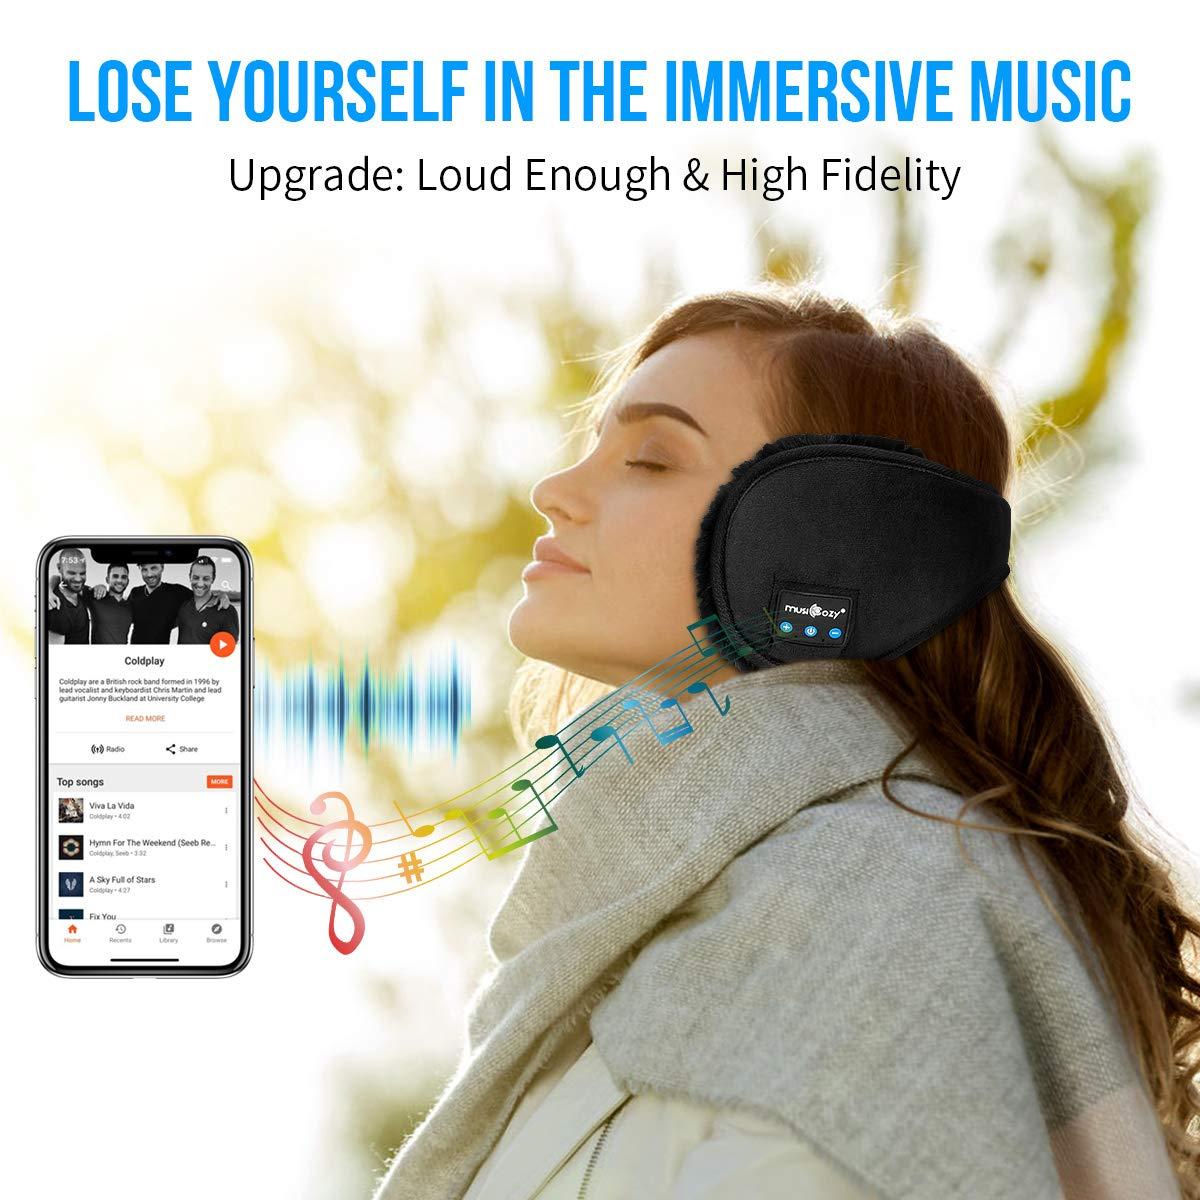 Bluetooth Ear Warmers Ear Muffs For Winter Women Men Kids Girls Musicozy Bluetooth Earmuffs Headphones Unique Tech Top Gadgets Travel Cool Birthday Gifts Dad Mom Her Him Teen Boys Girls Adults